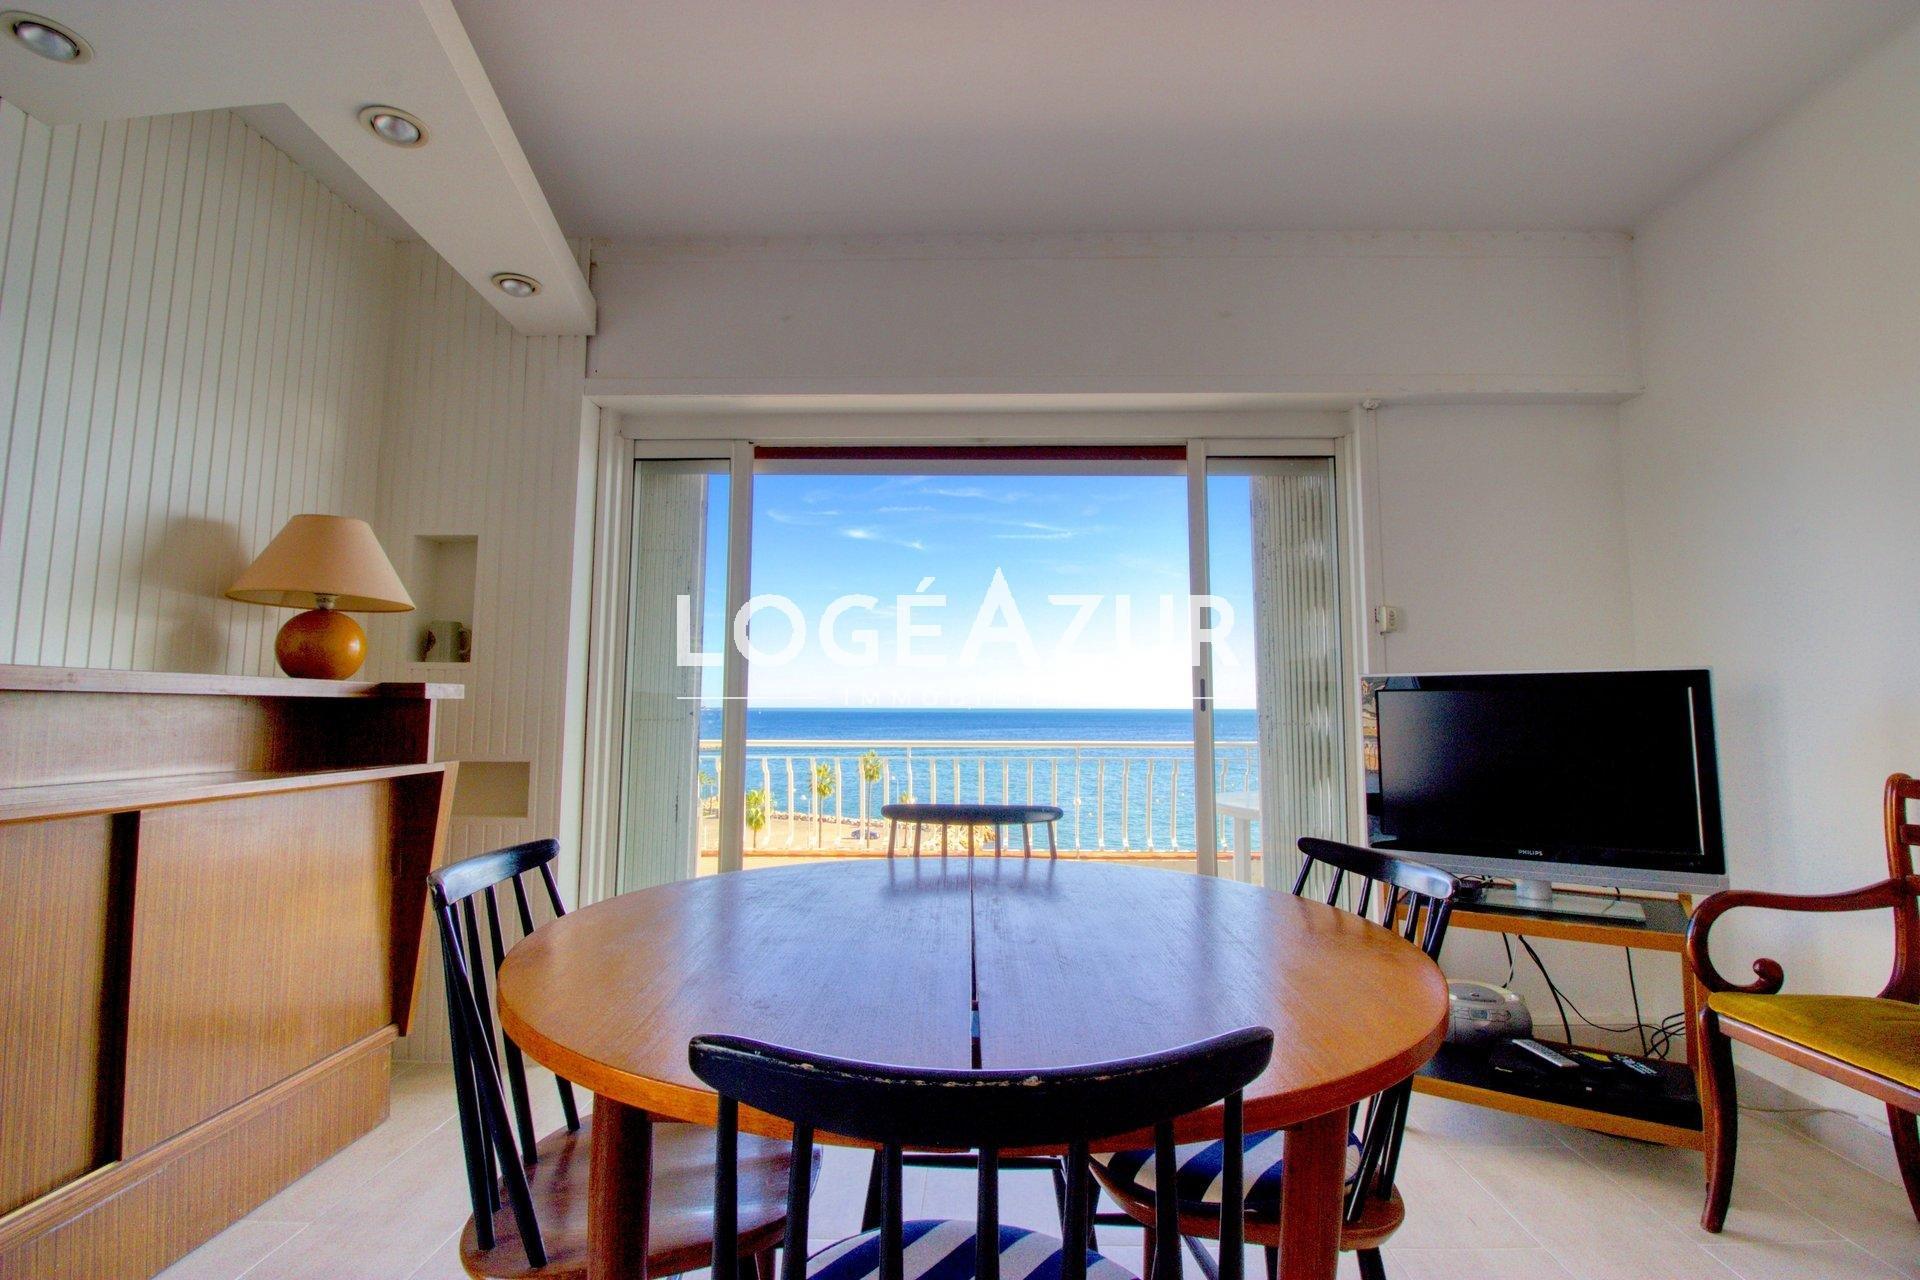 Sale apartment sea front Golfe-juan on the last floor